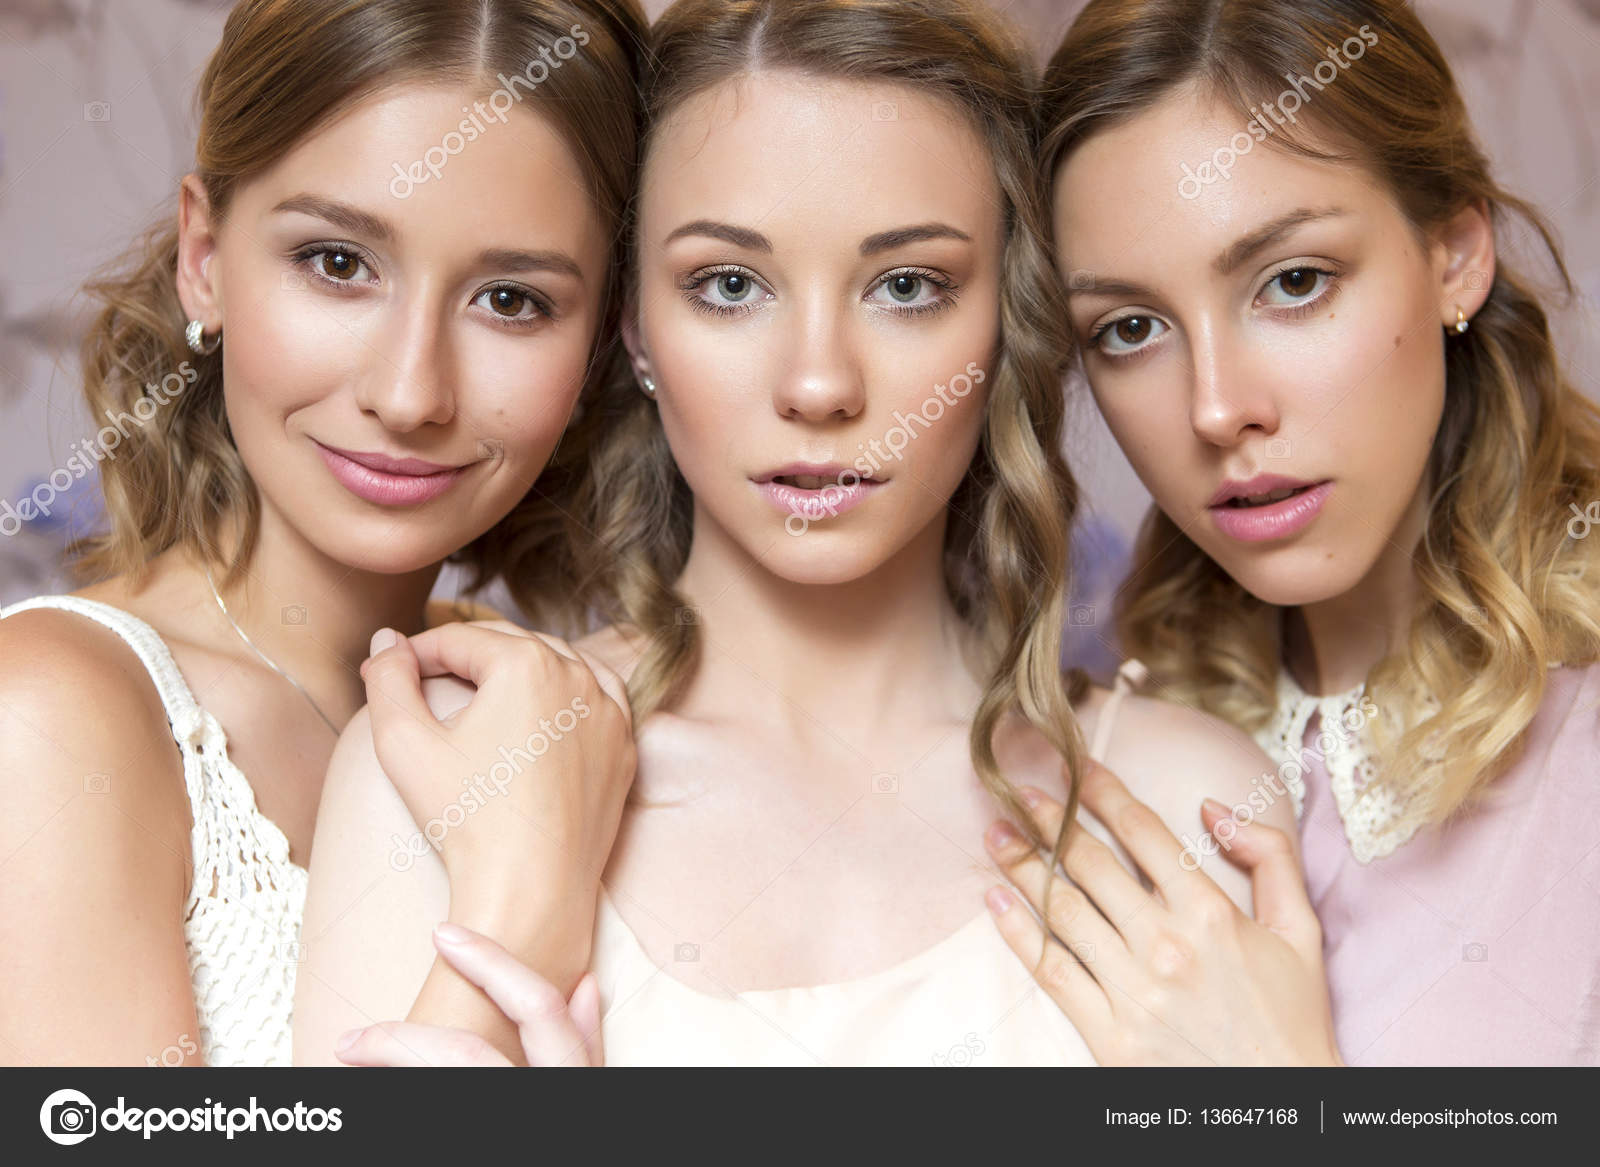 Look Portrait Young Three Beautiful Women